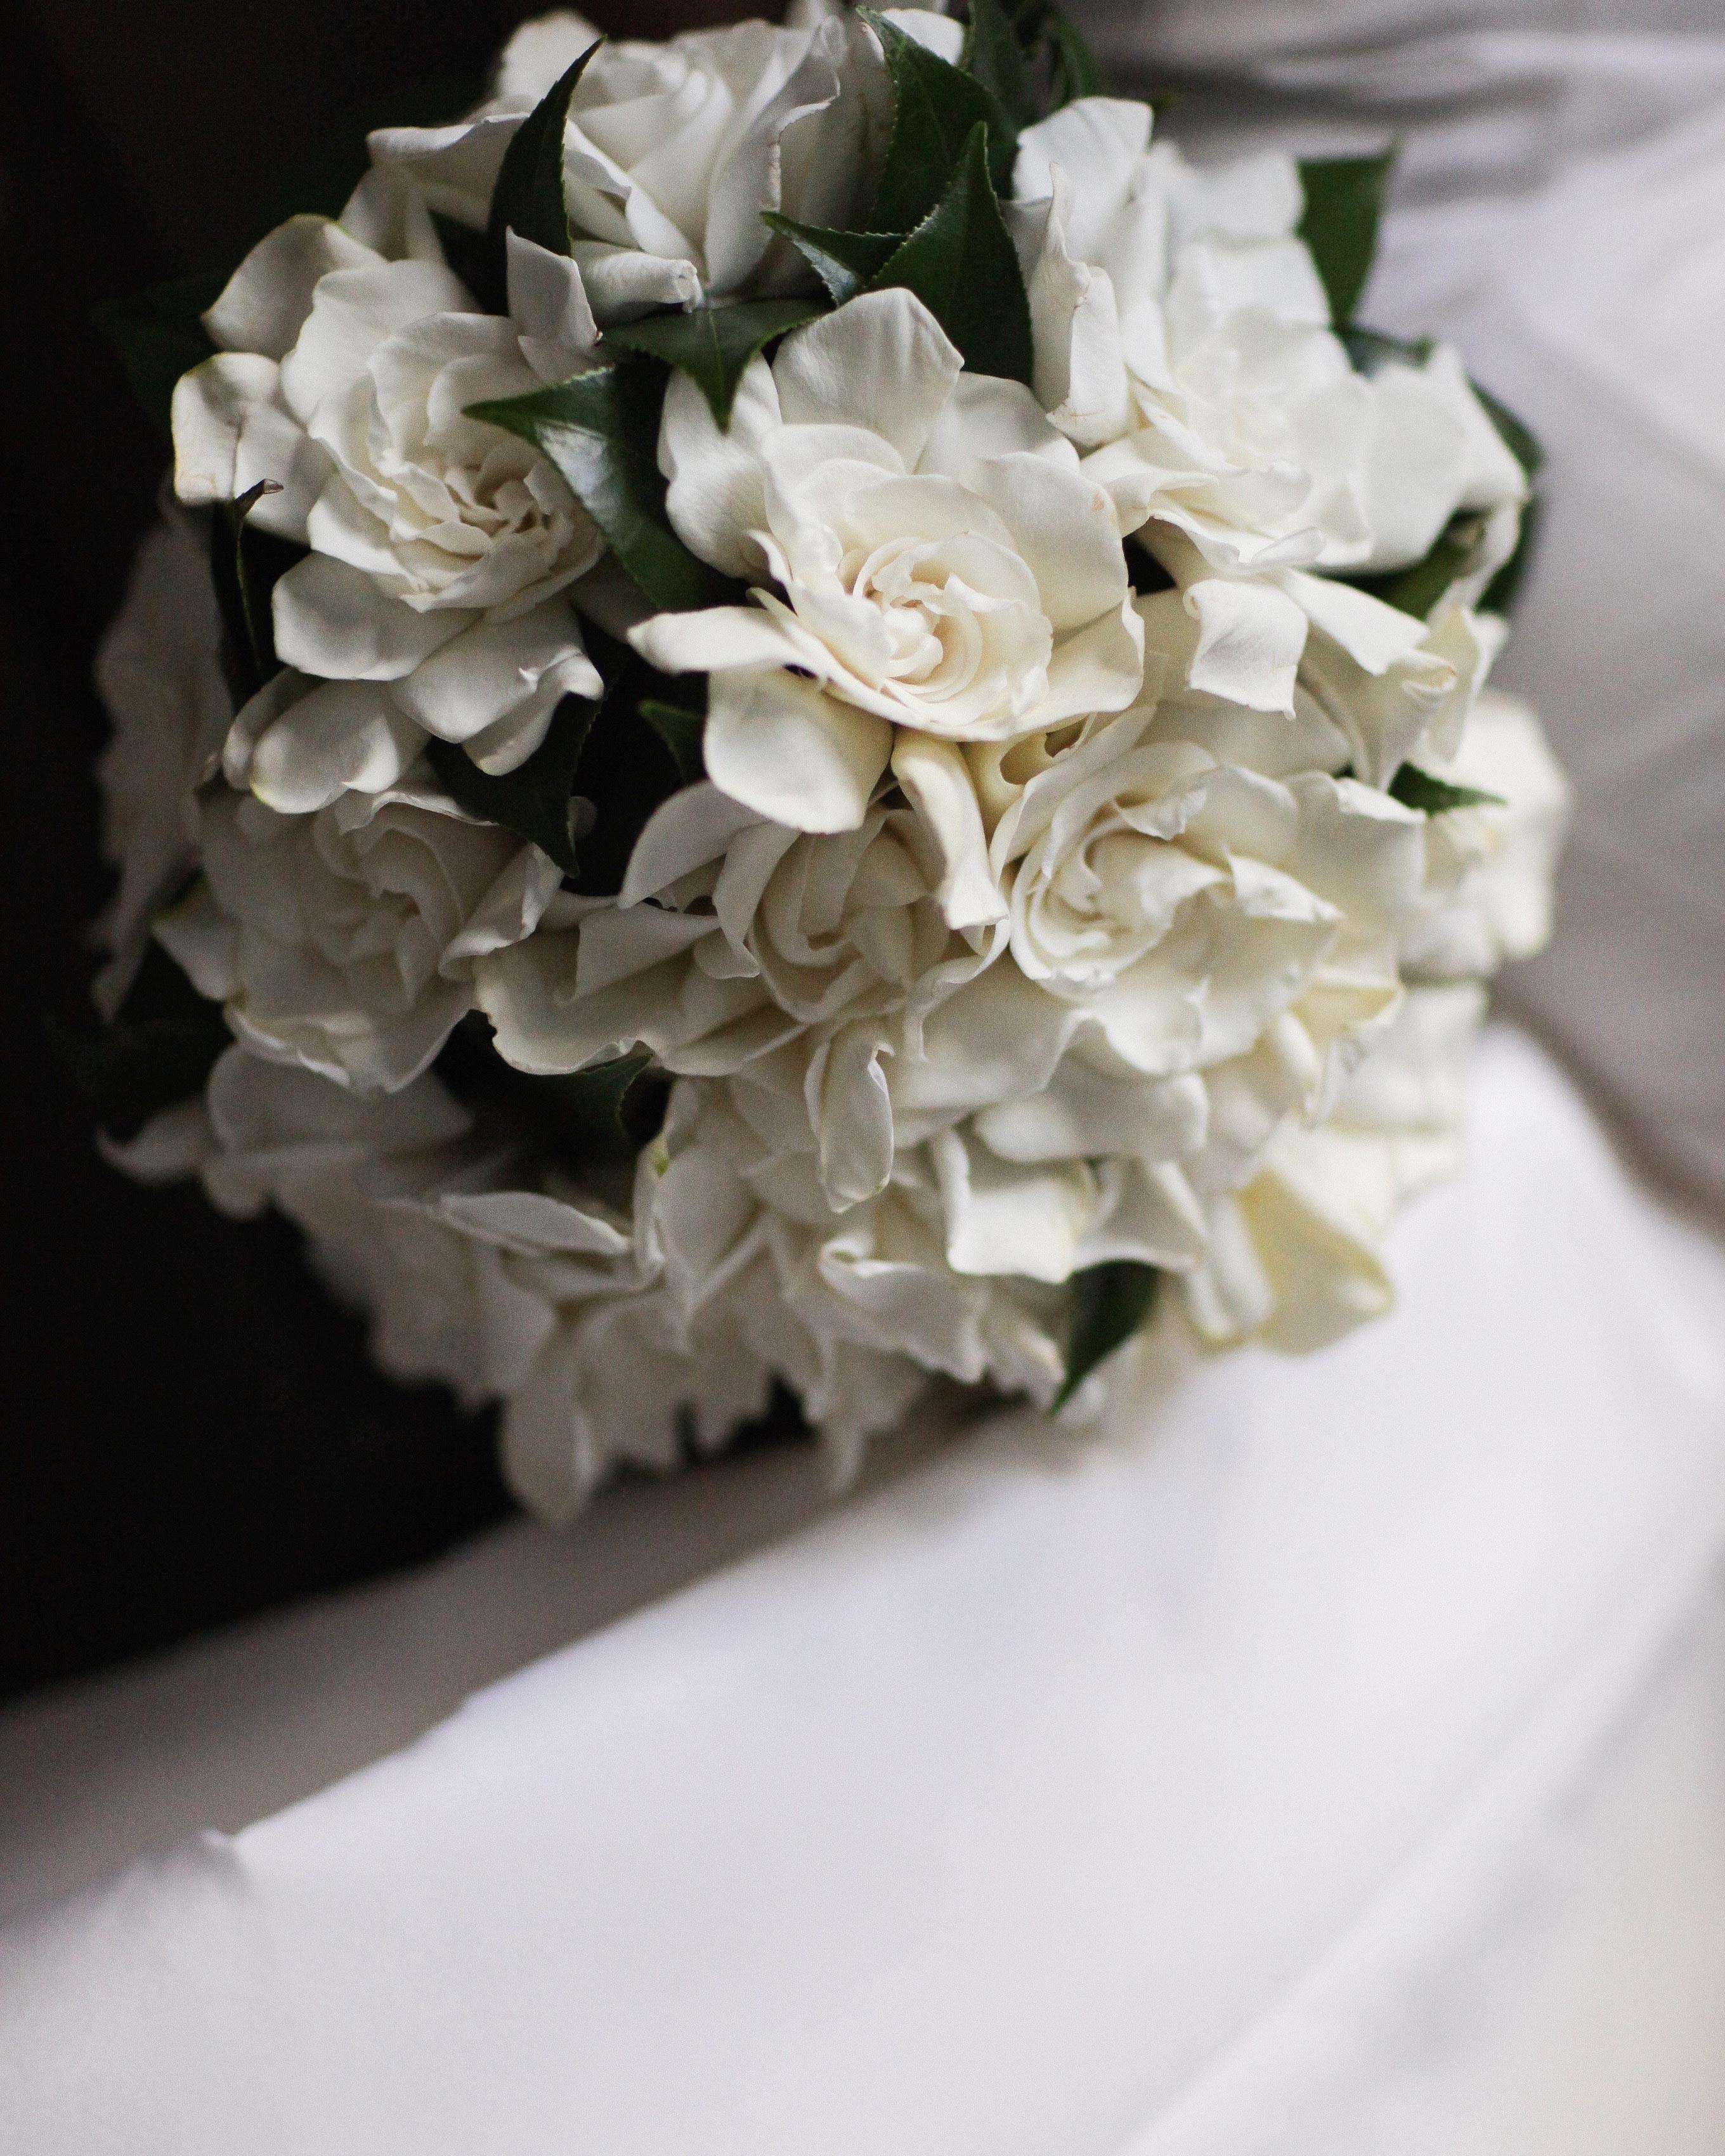 ron-wendt-cascading-bouquet-gardenias-finished-bouquet-0616.jpg